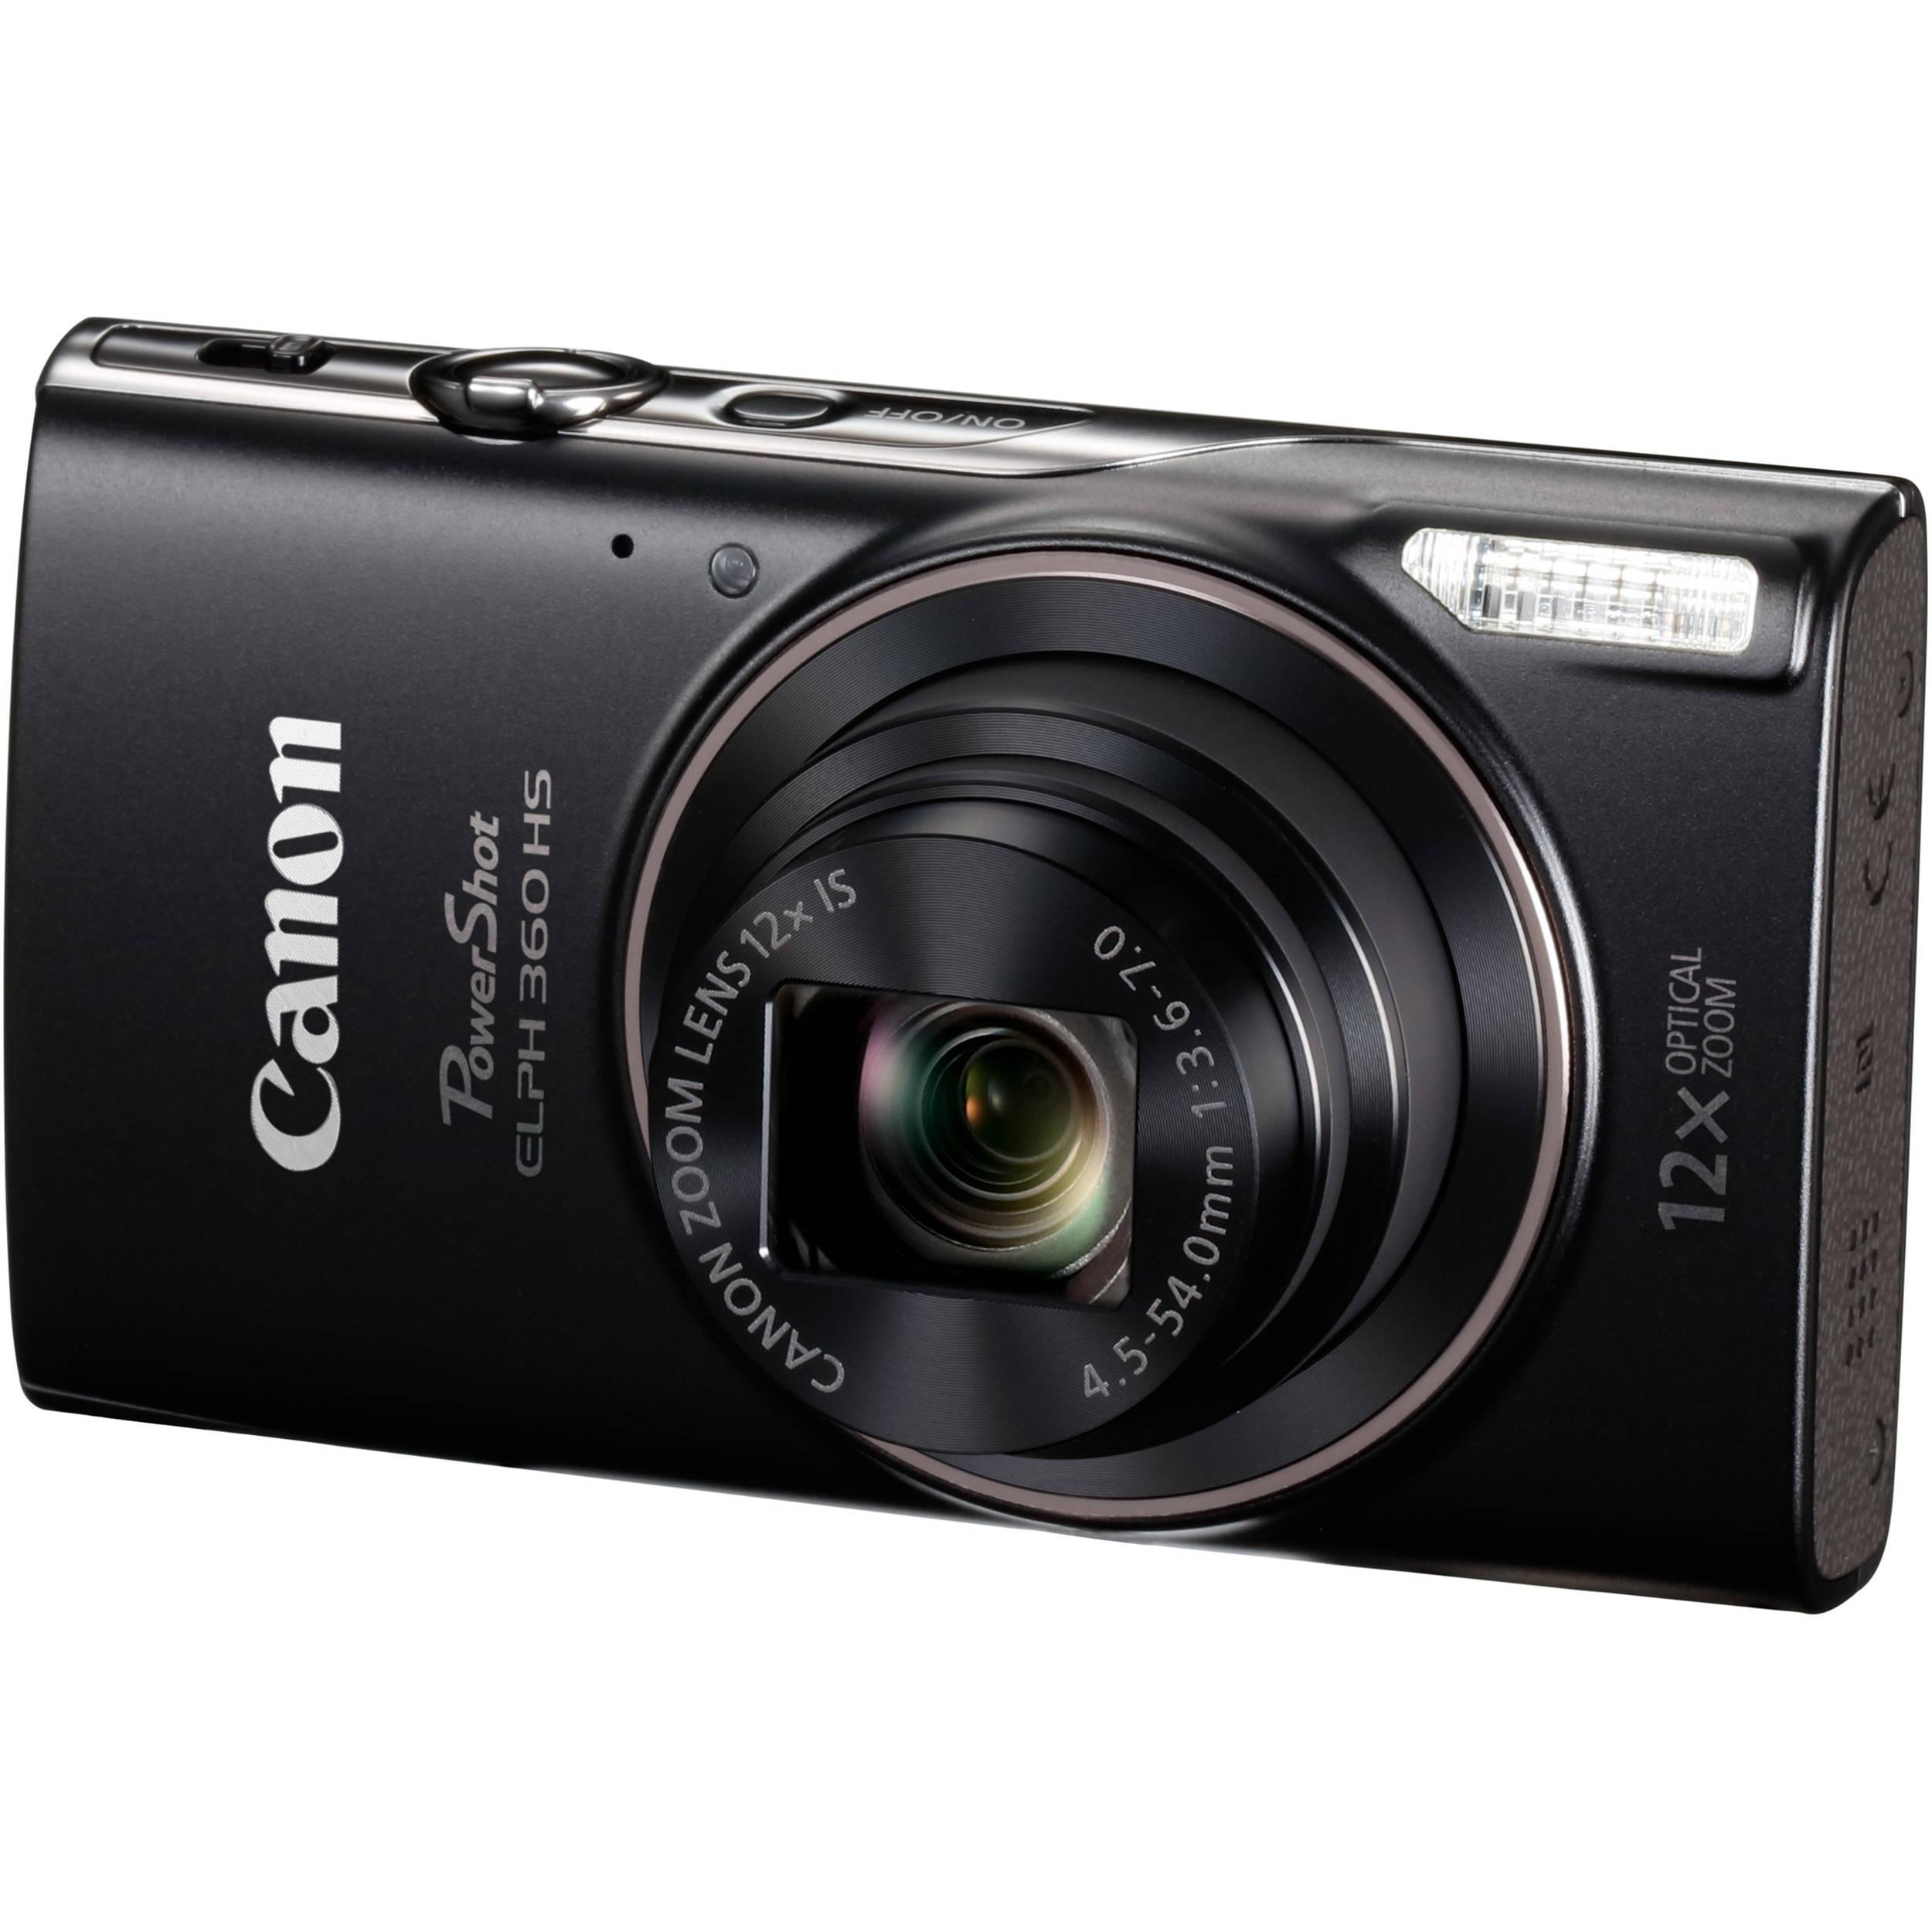 Canon Shot Elph 360 Hs Digital Camera Black